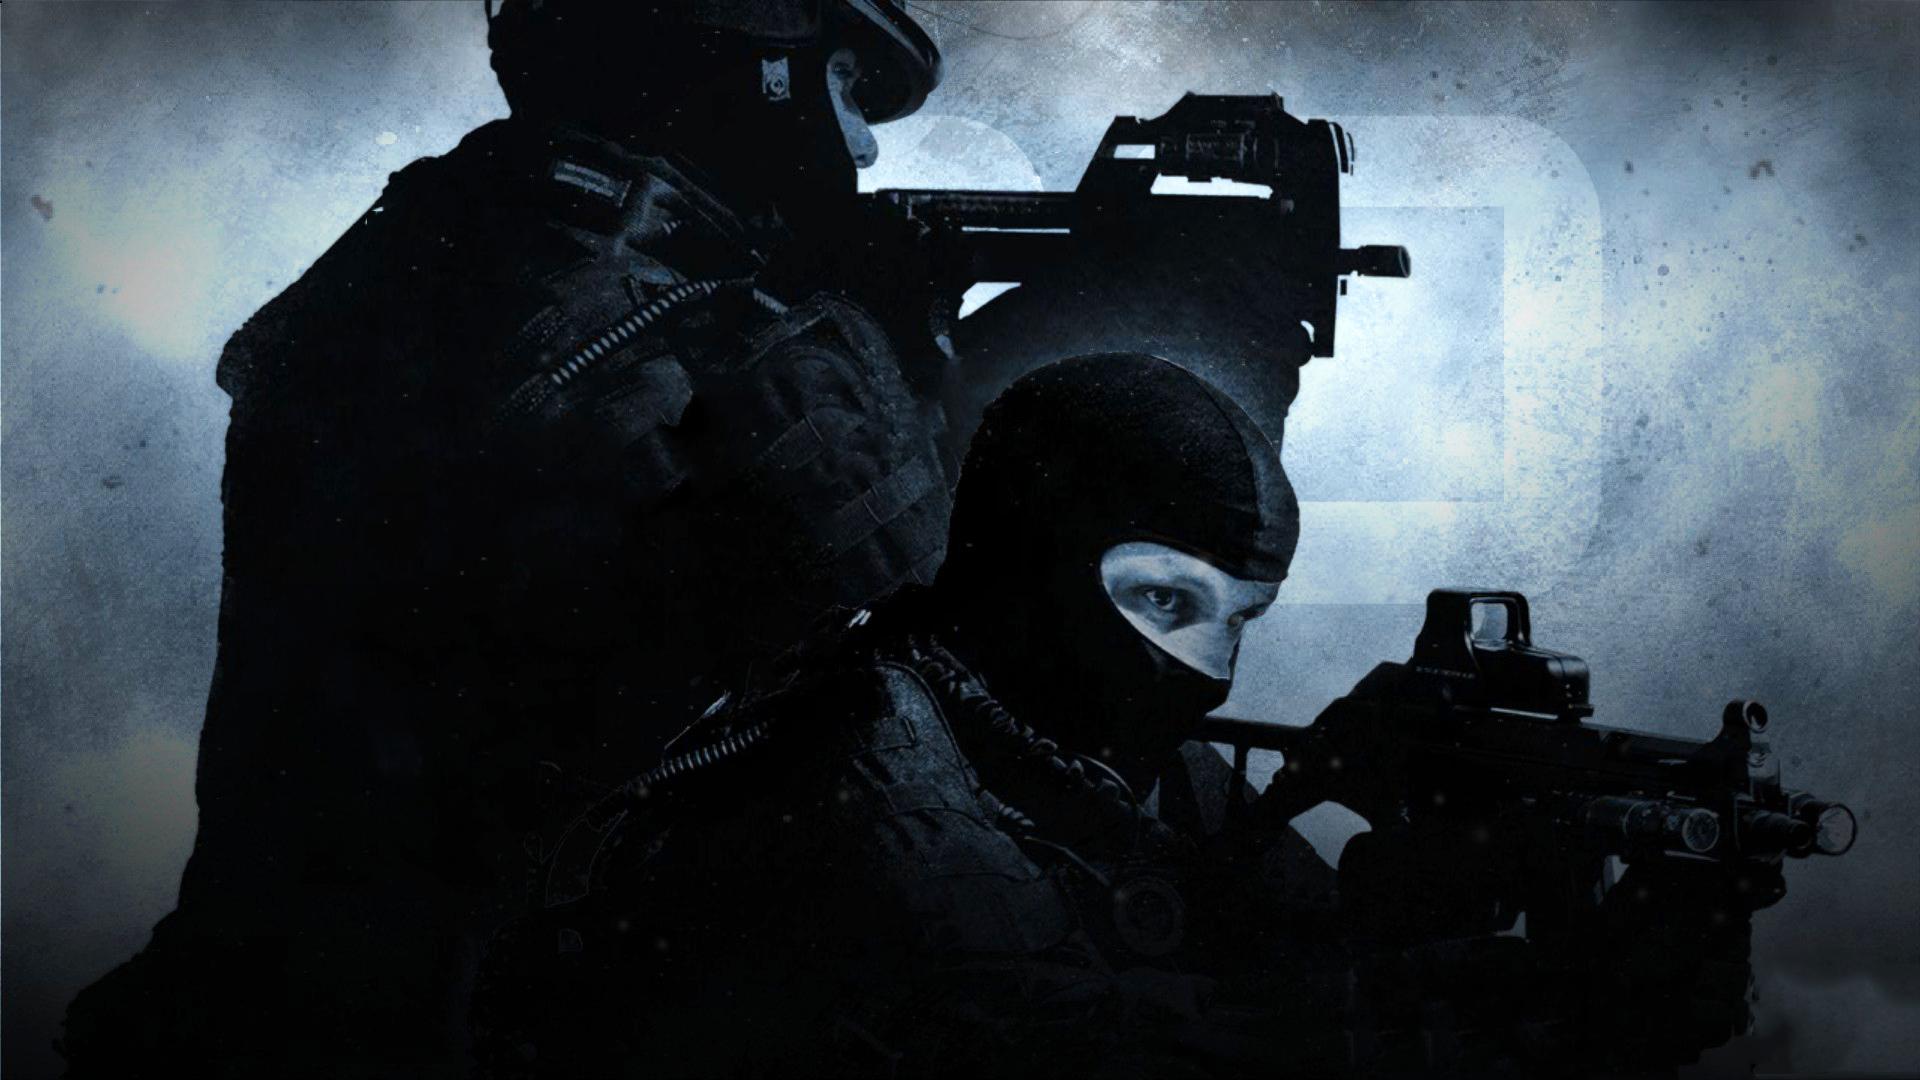 Counter-Strike-Dual-Screen-x-ID-wallpaper-wp3804090